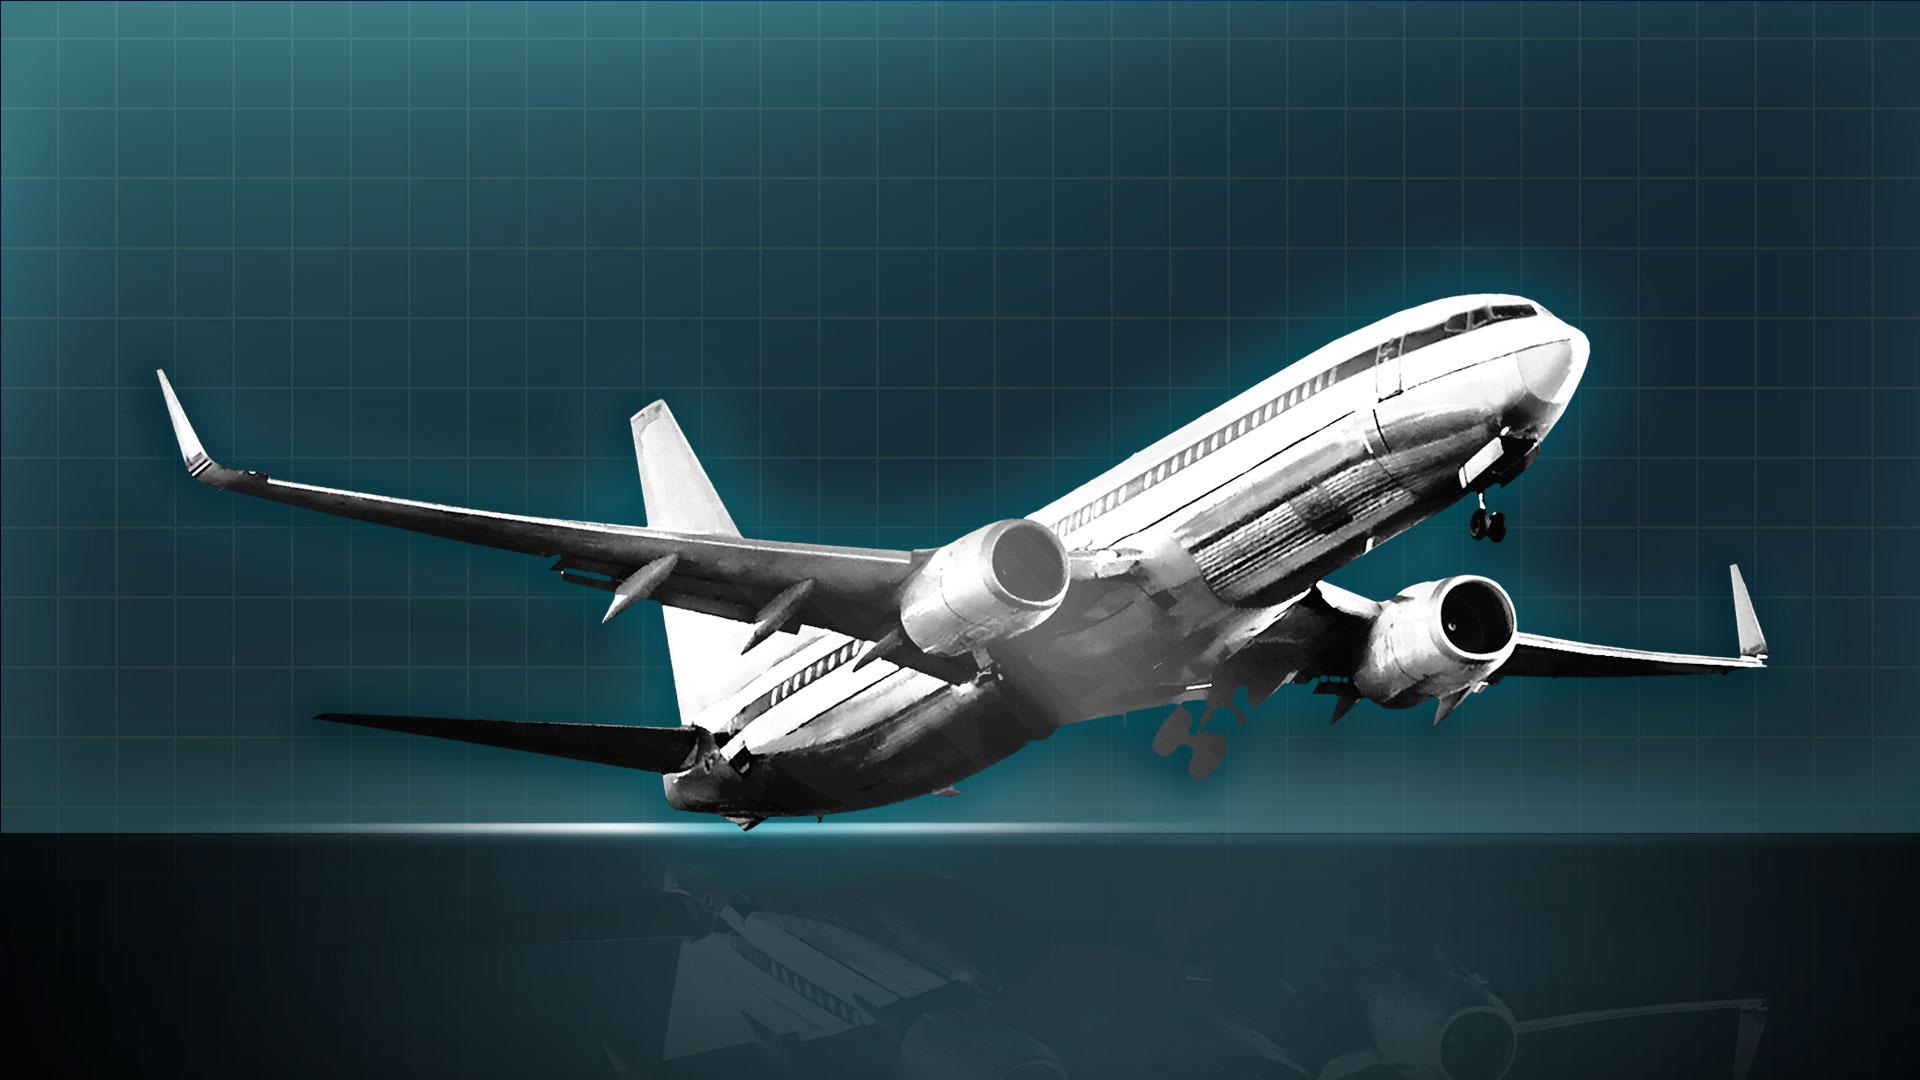 KELO Plane